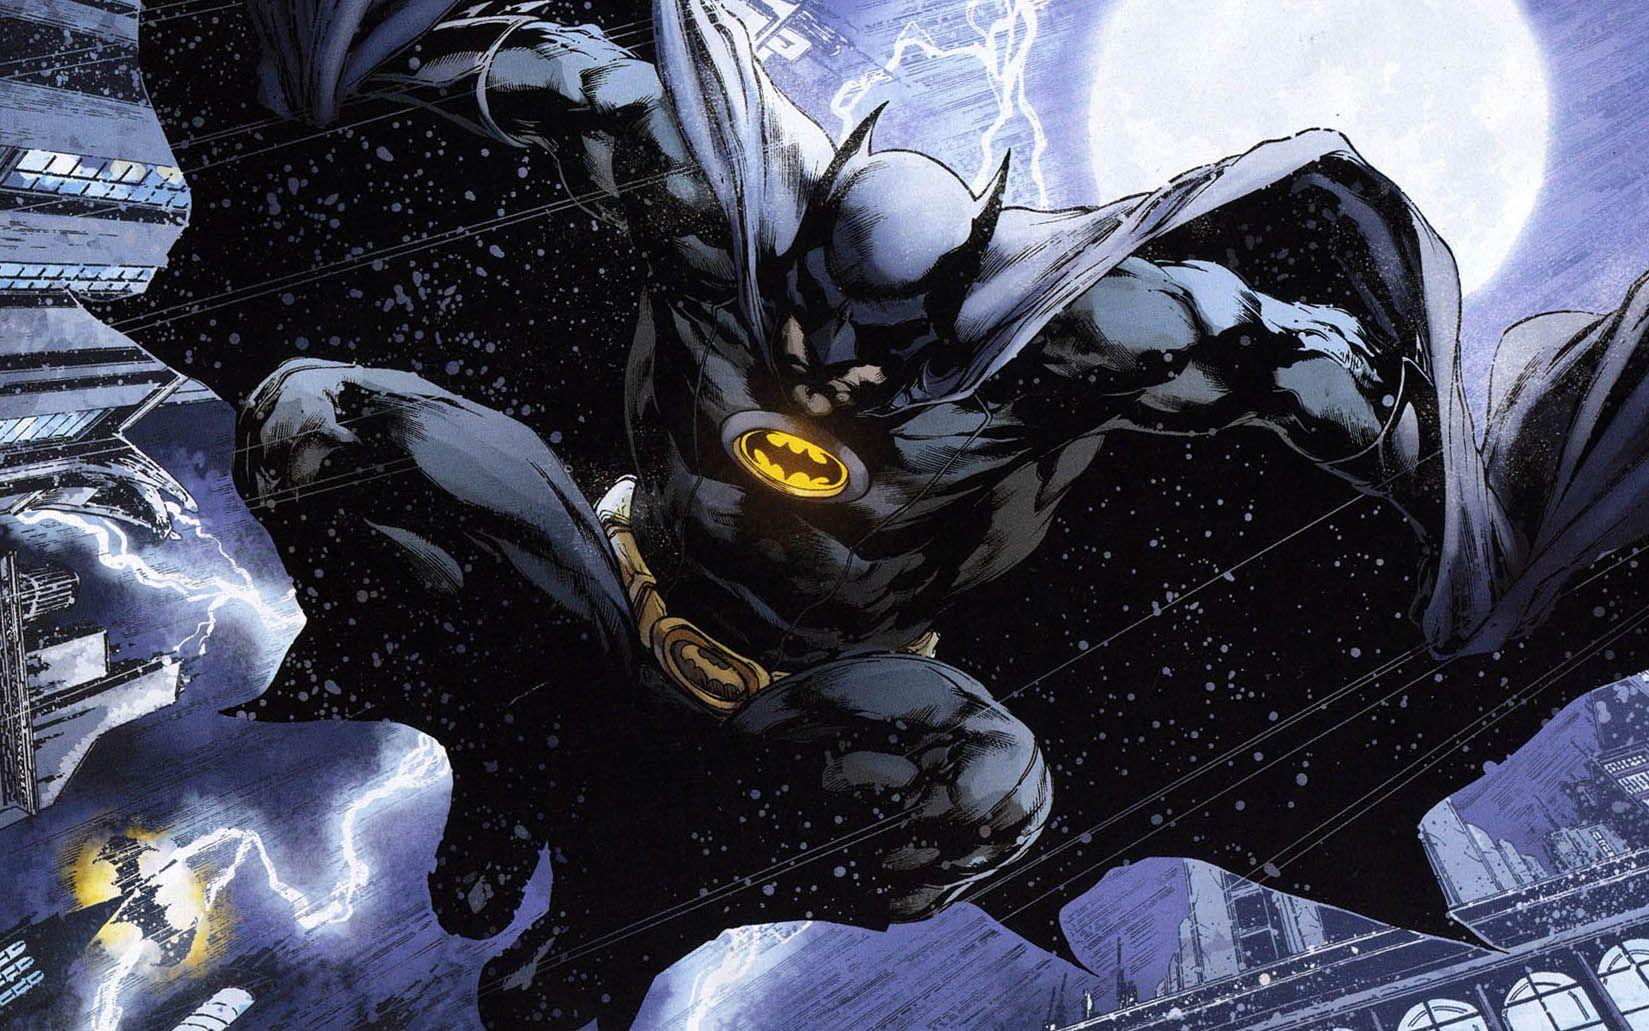 Batman Wallpaper Pesquisa Do Google Batman Comic Wallpaper Batman Wallpaper Comics Wallpaper